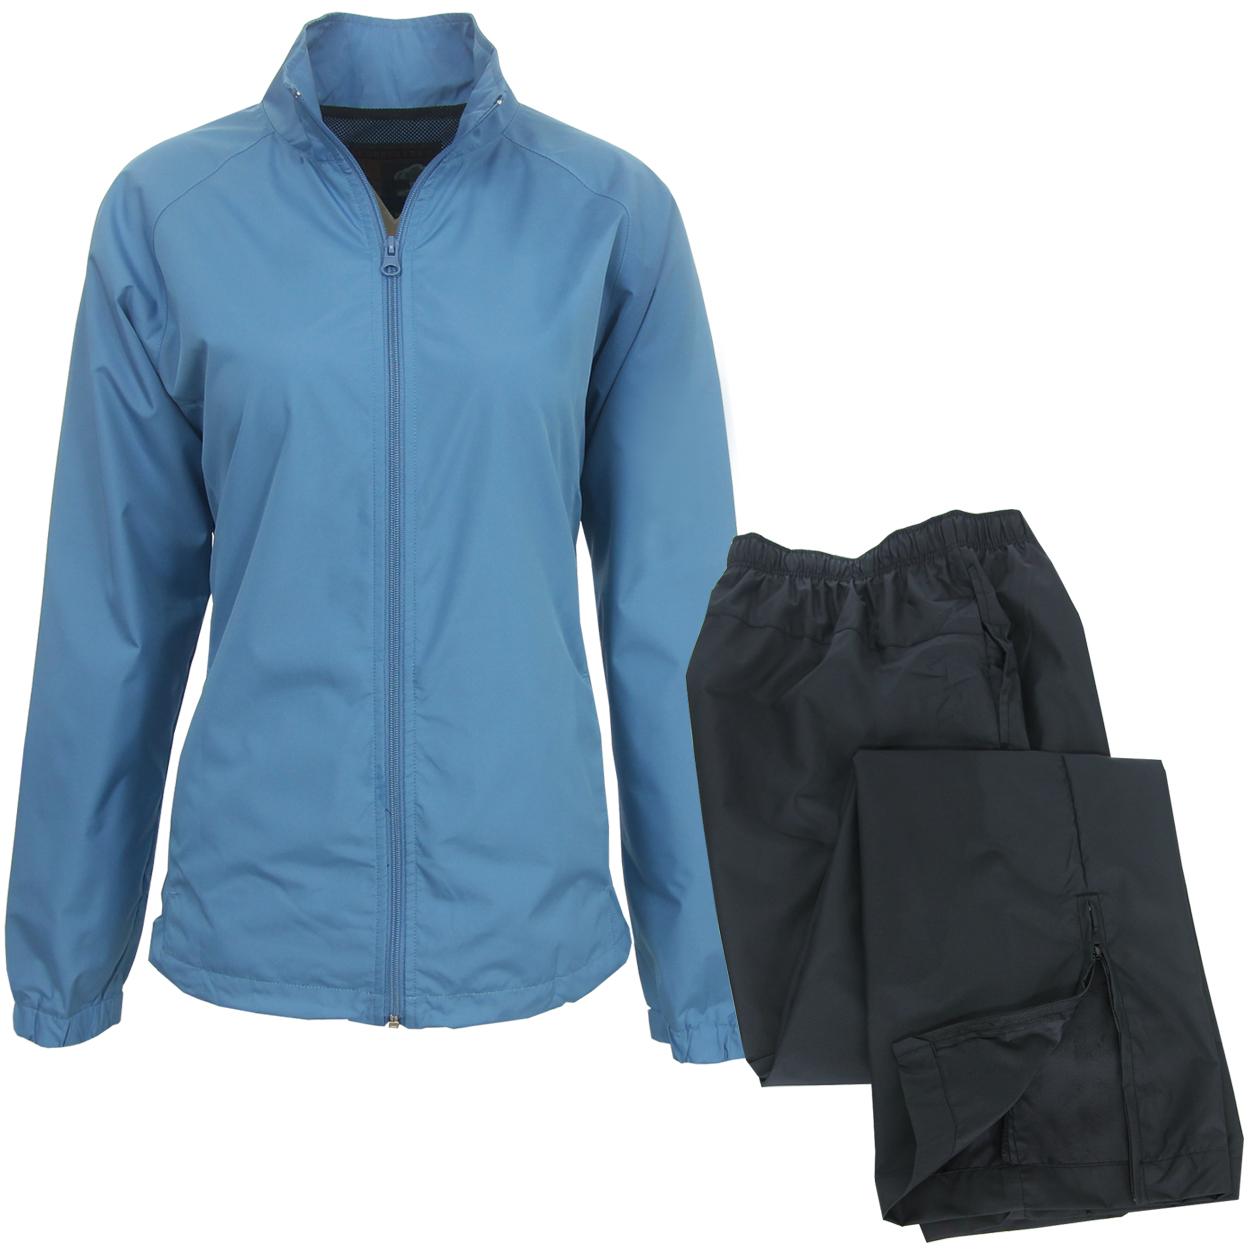 Forrester Women's Packable Waterproof Golf Rain Suit